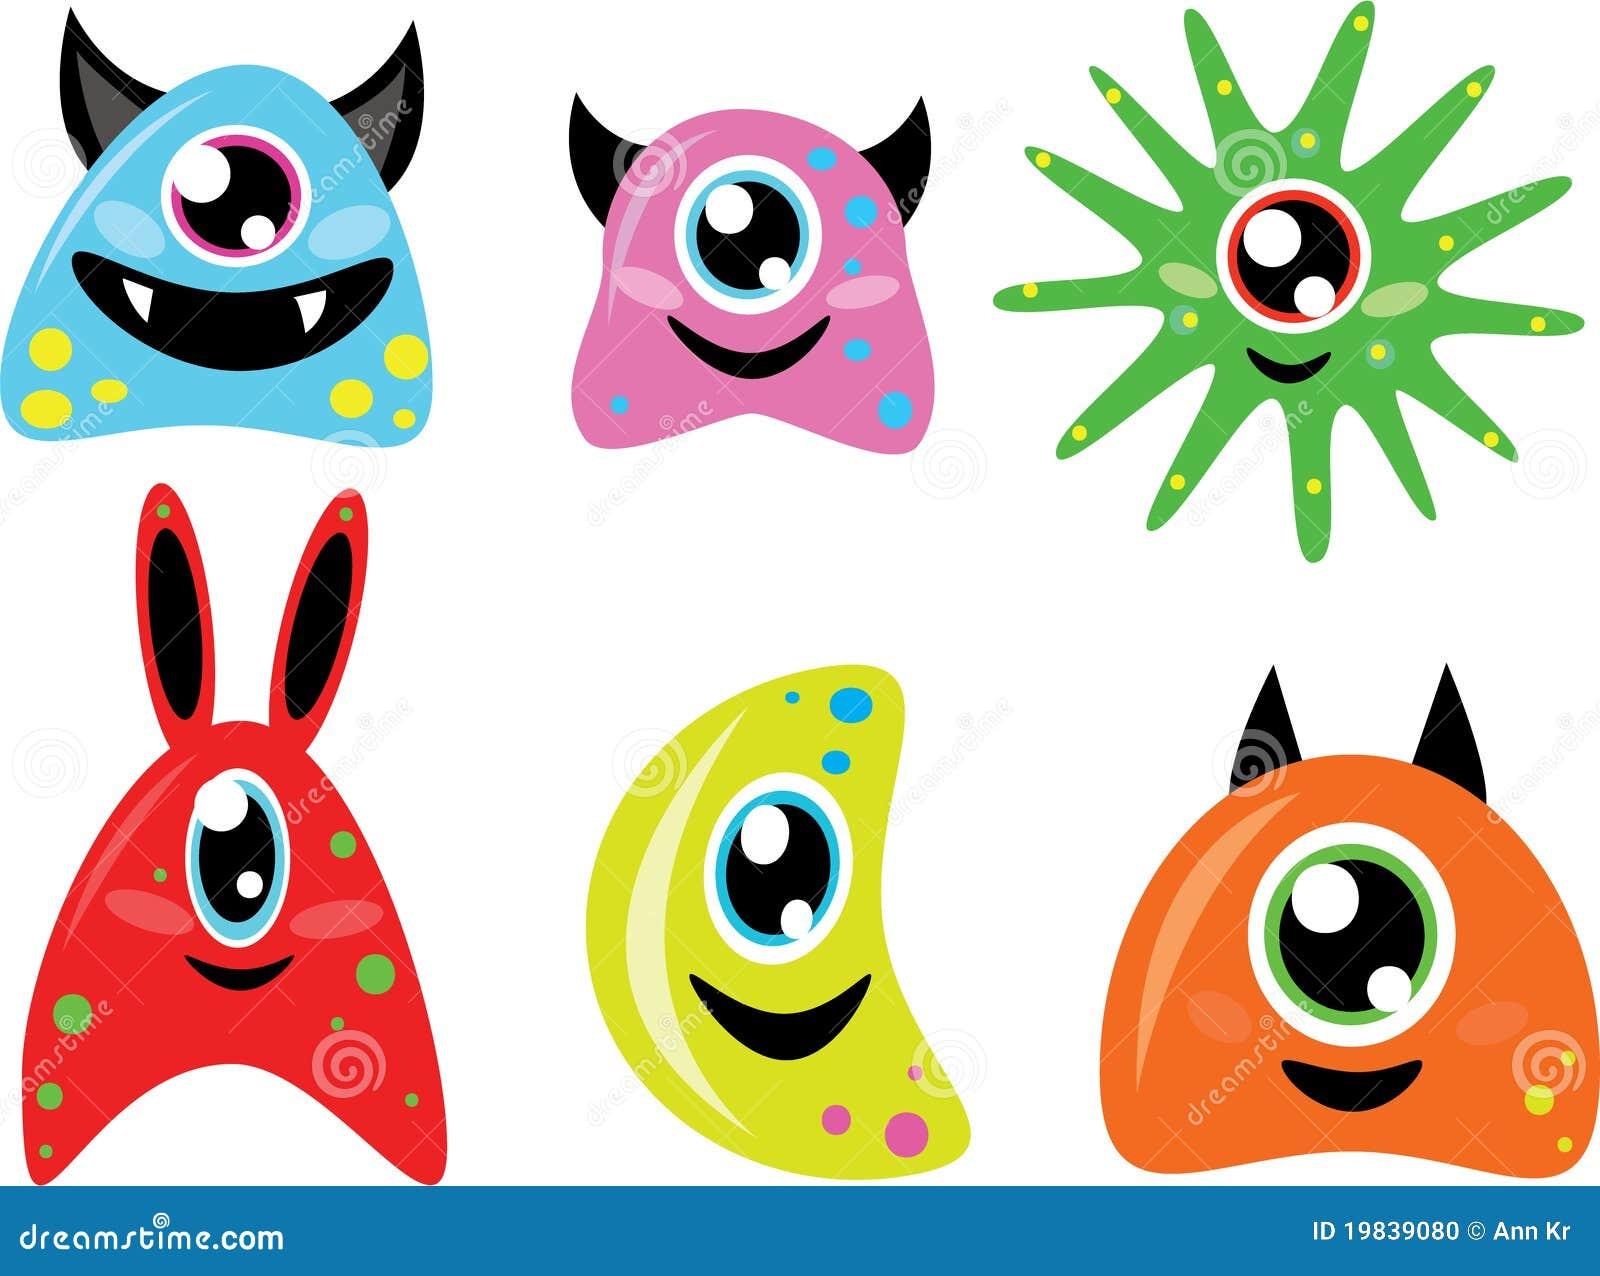 Cute doodle monsters